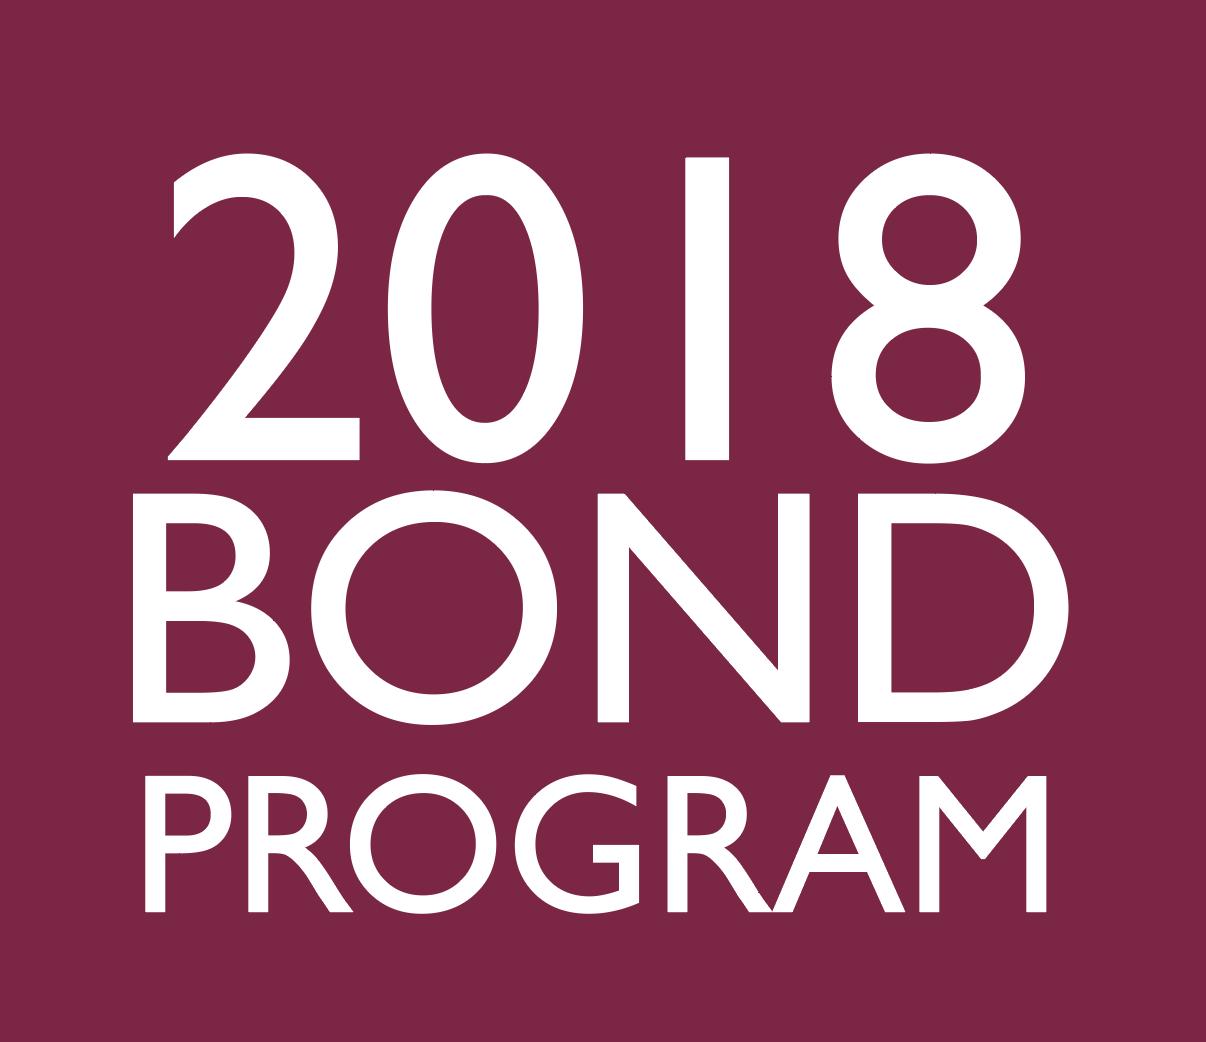 2018 Bond Program image